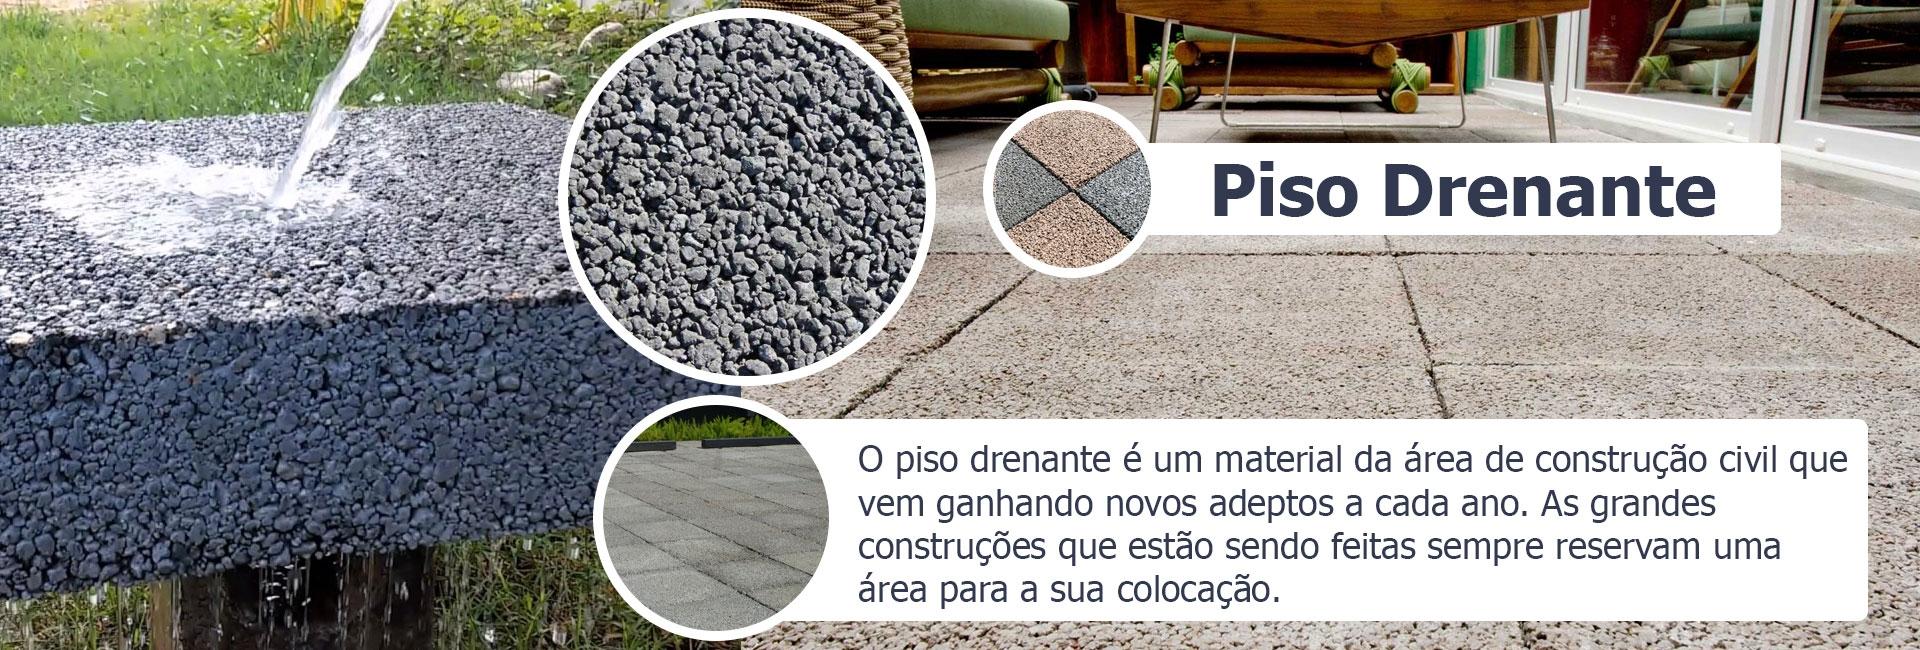 bloco-canaleta-de-concreto-cimentpav-banner1